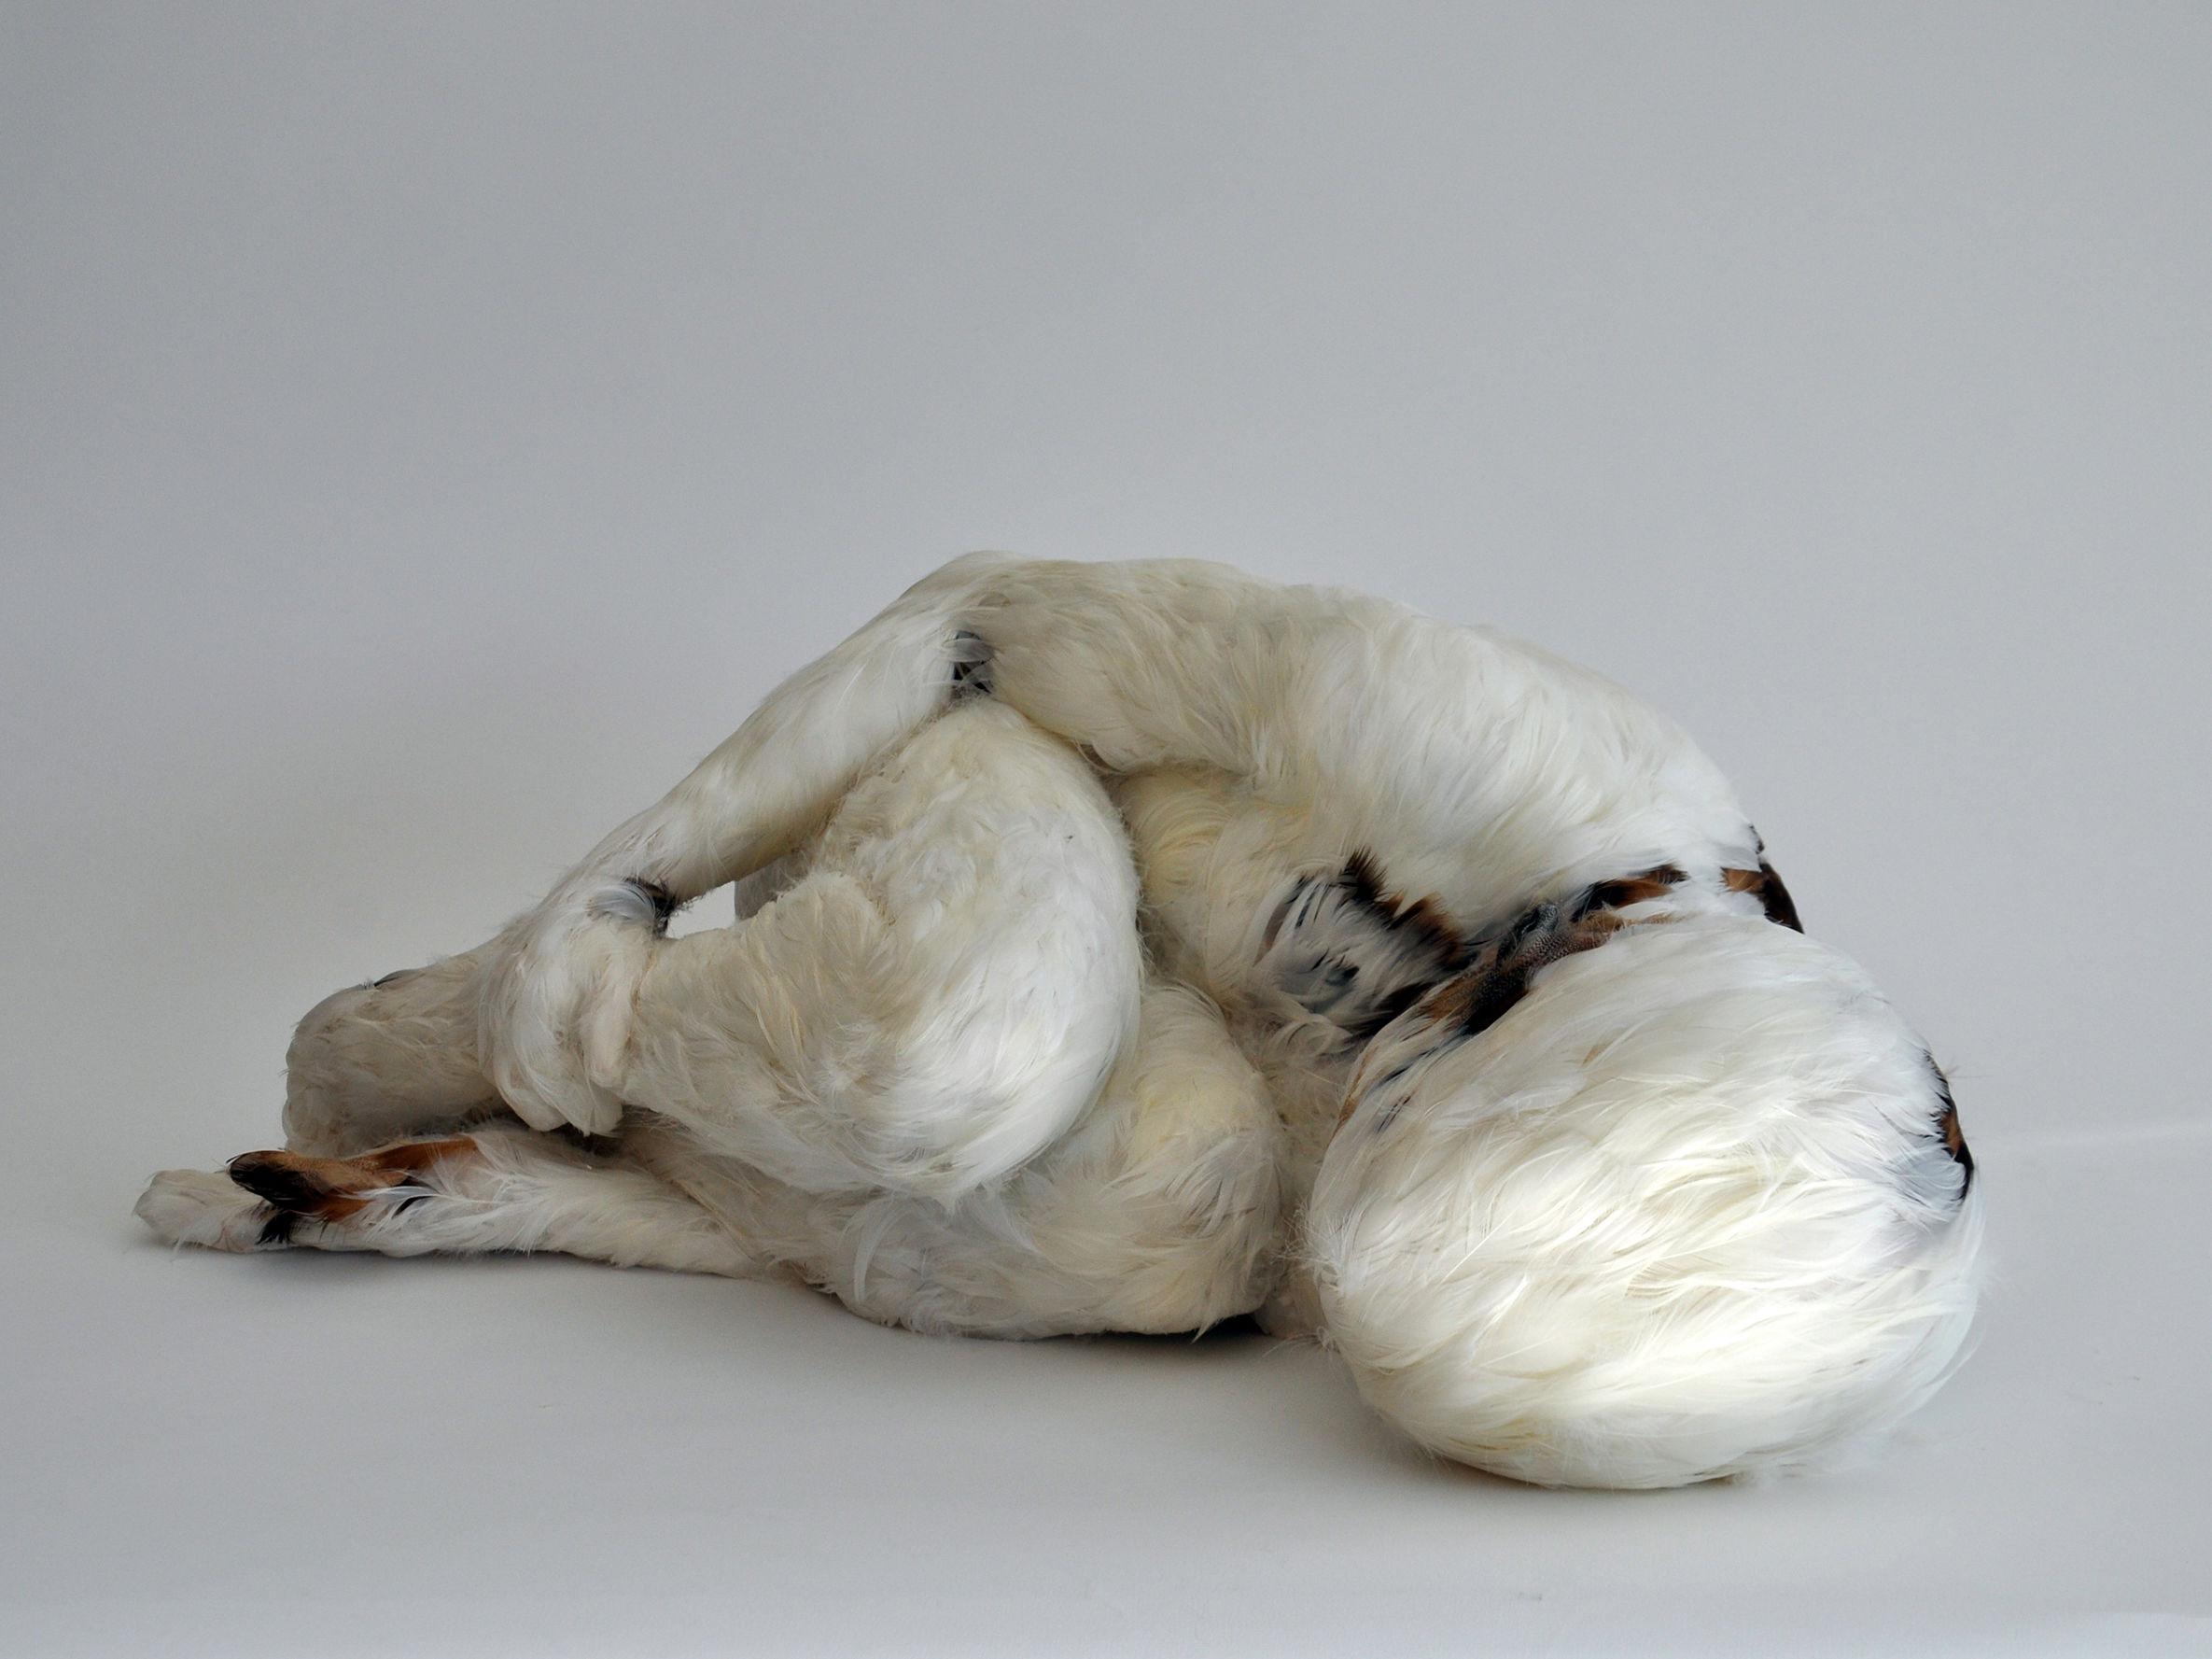 Thematische Führung im Dialog: A Feather's not a Bird